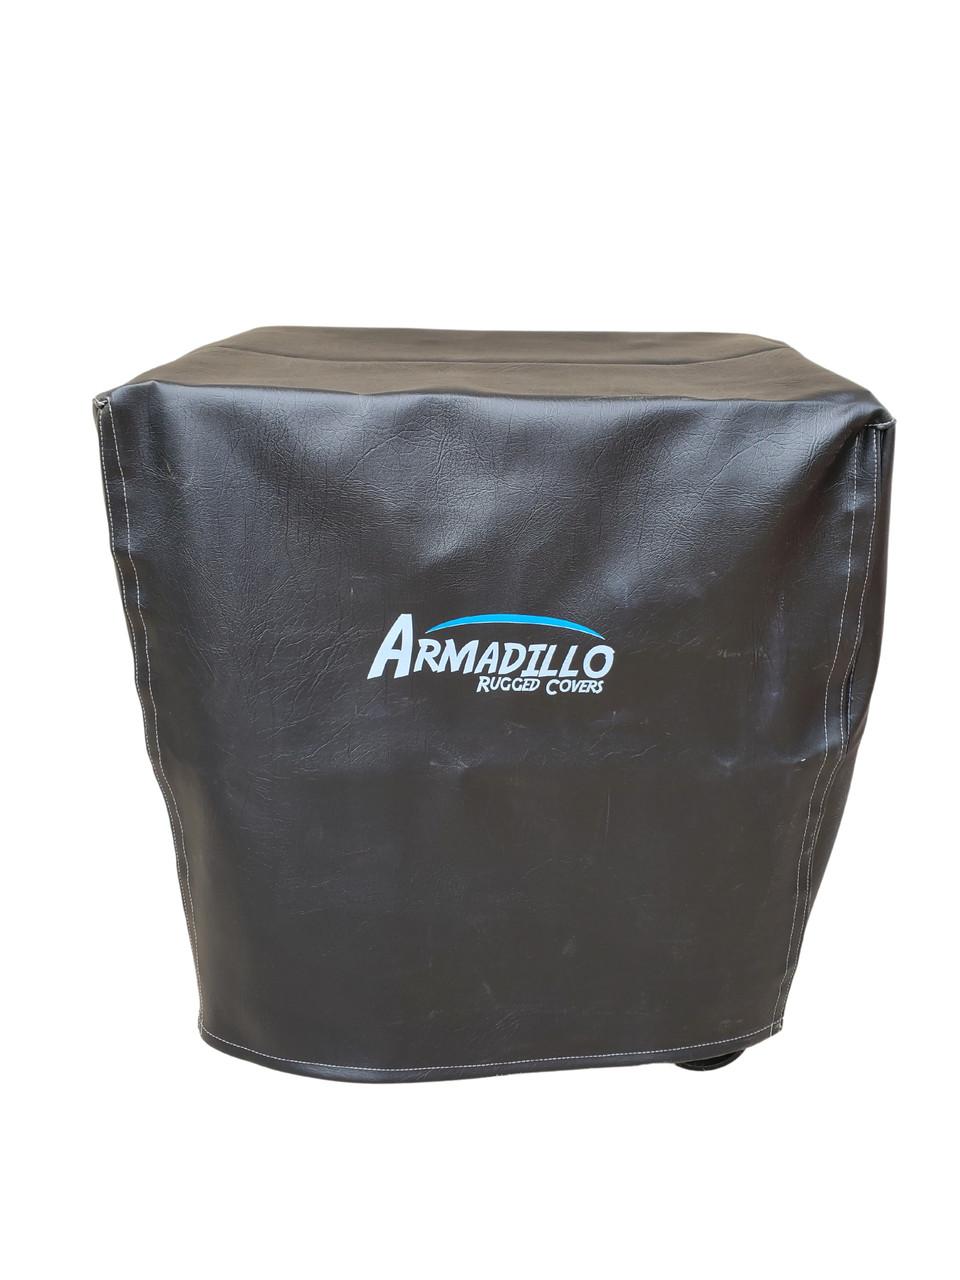 Armadillo Winterlux custom tool chest cover